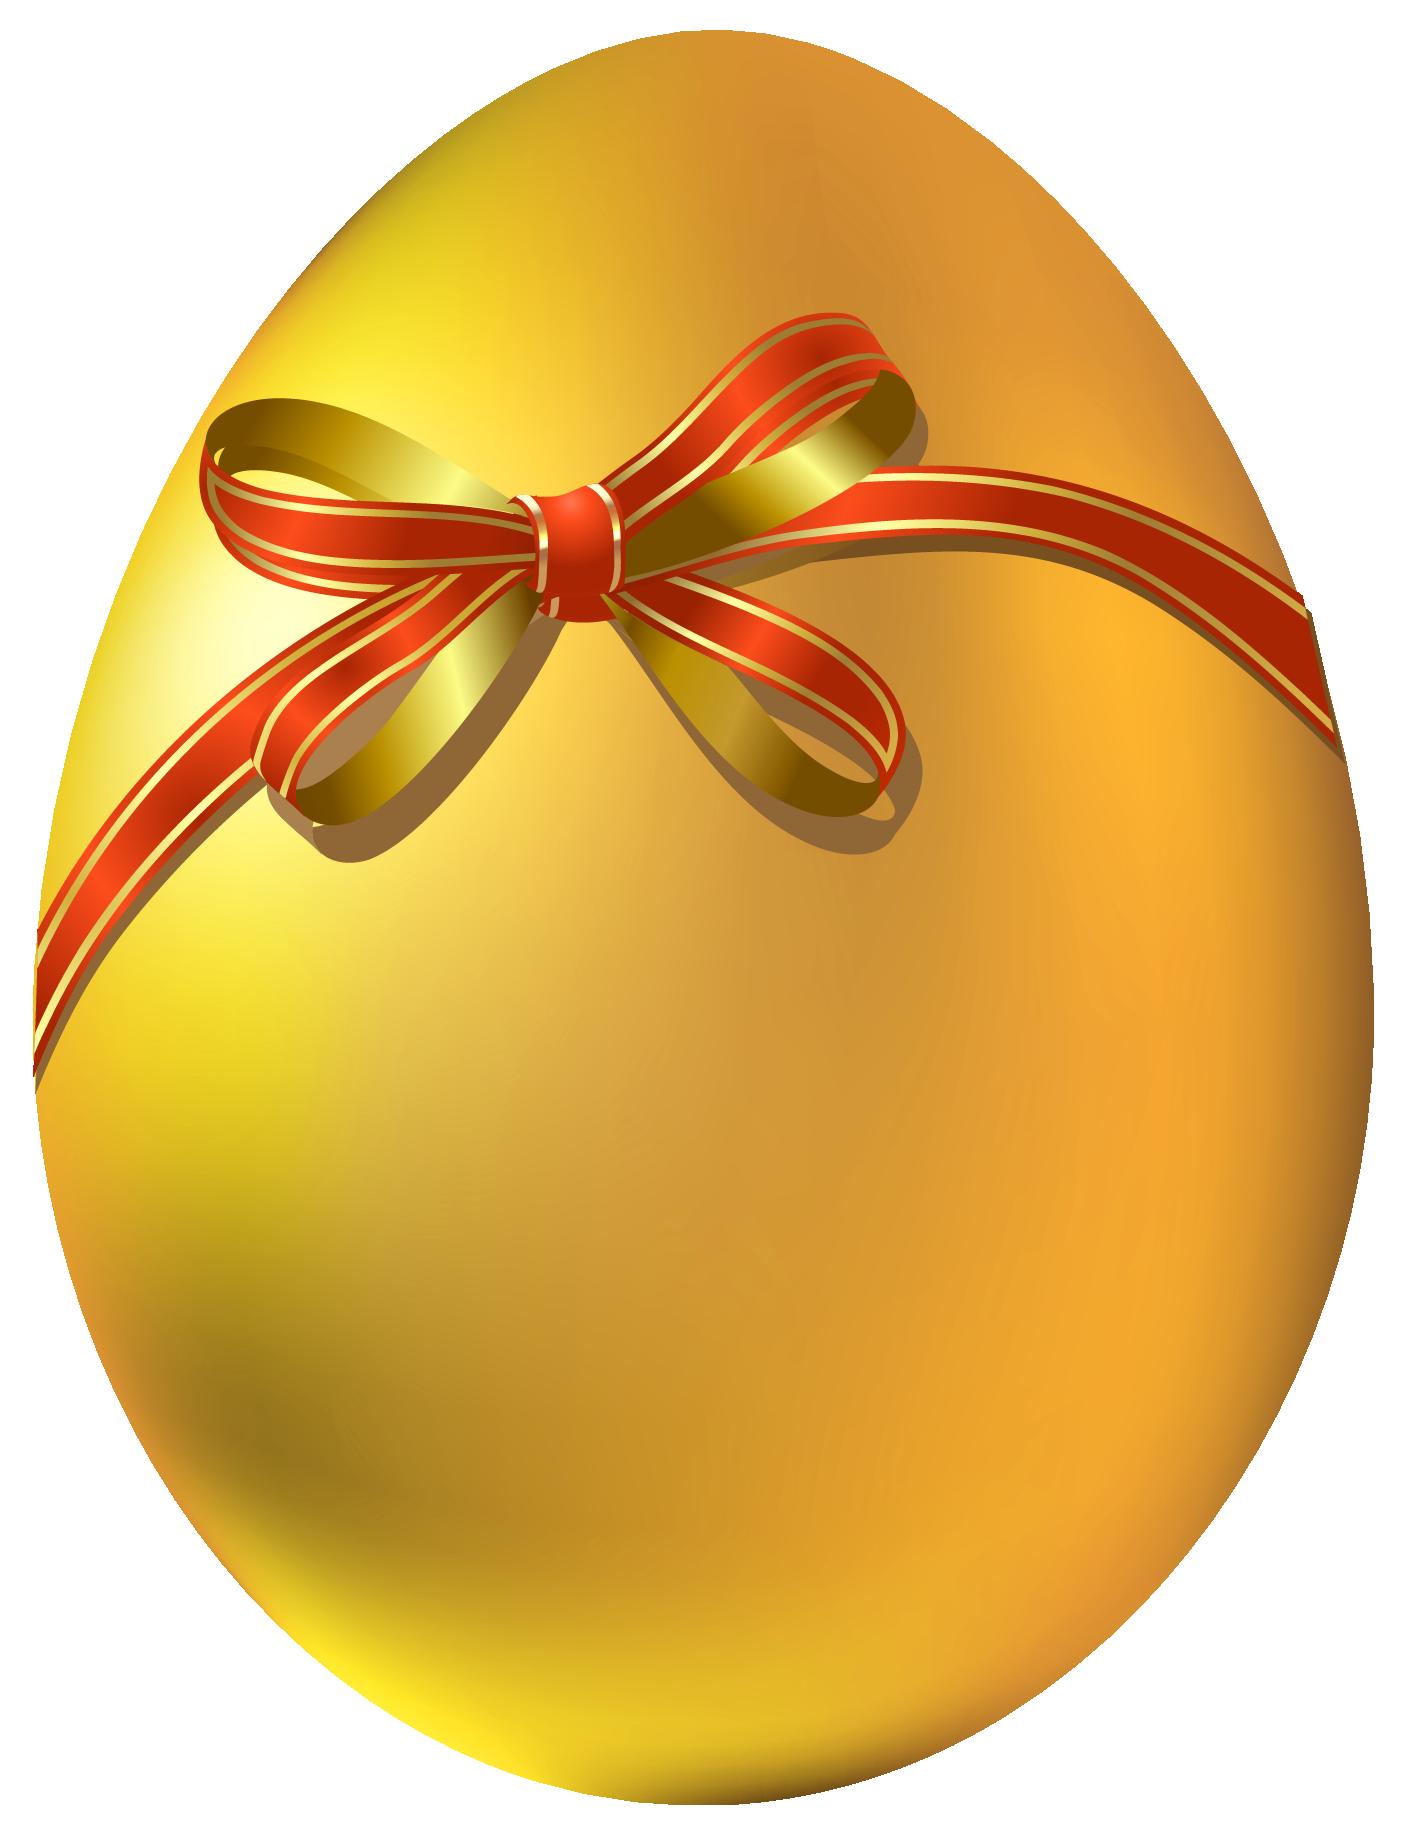 Golden easter egg clipart png - ClipartFest banner free stock